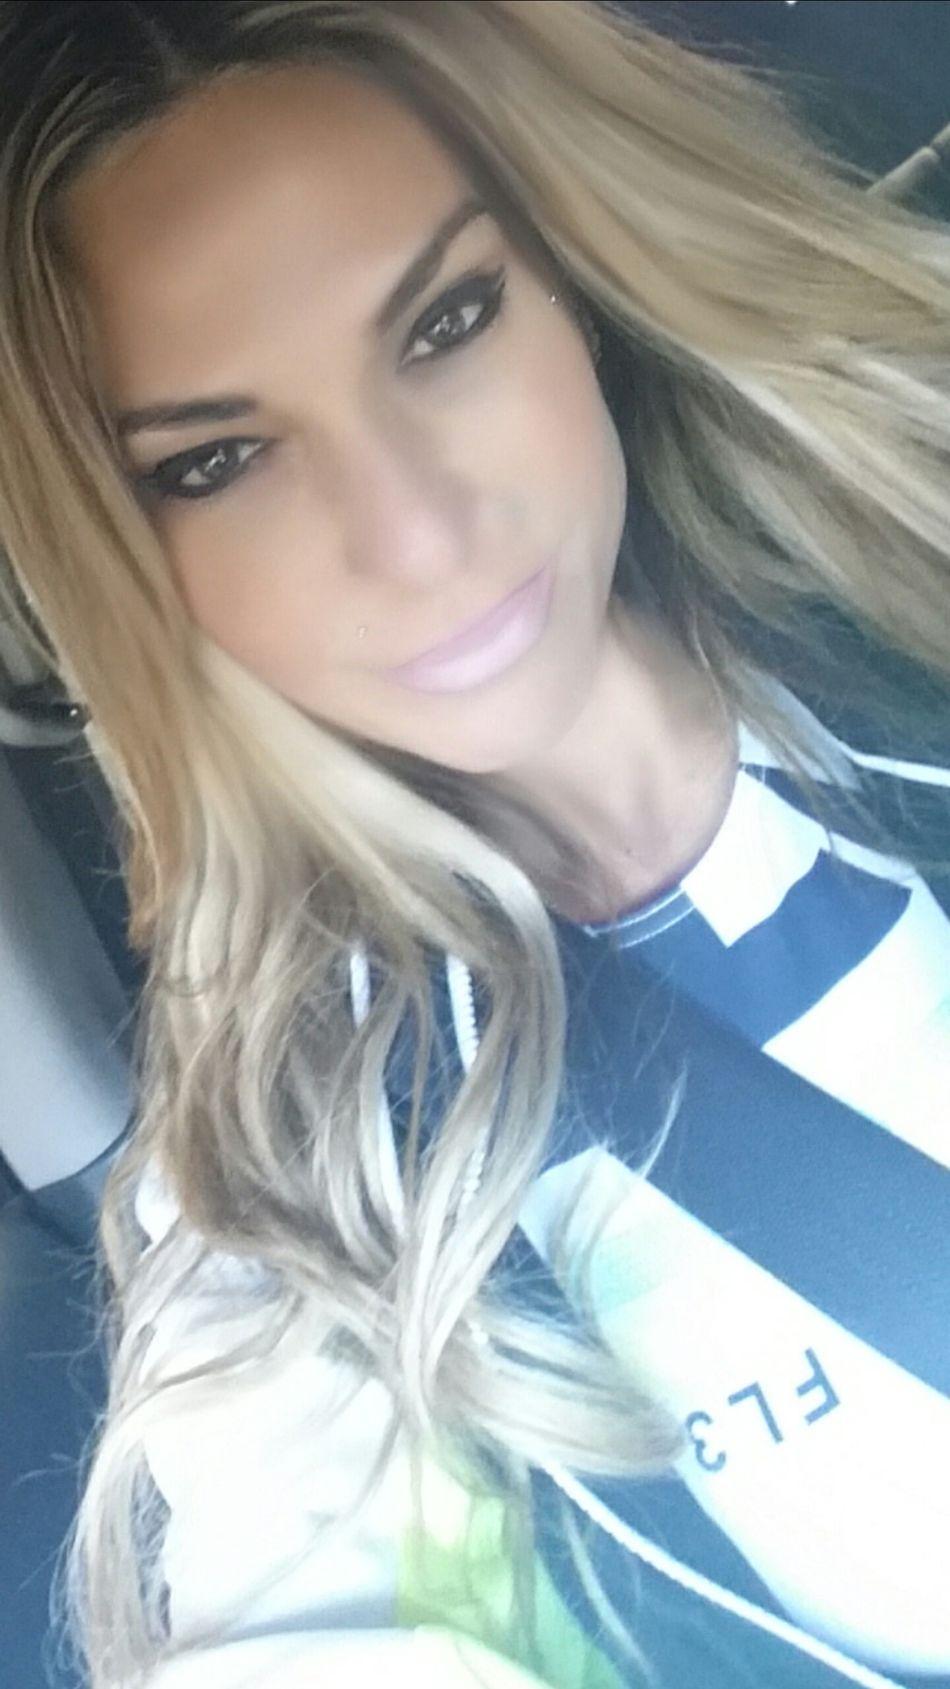 www.anastasiaverkos.com Carselfie Smile Sunshine Beautiful Day Beautiful Girl Off To The Gym Have A Nice Day♥ Seeyousoon Bye Bye Kisses